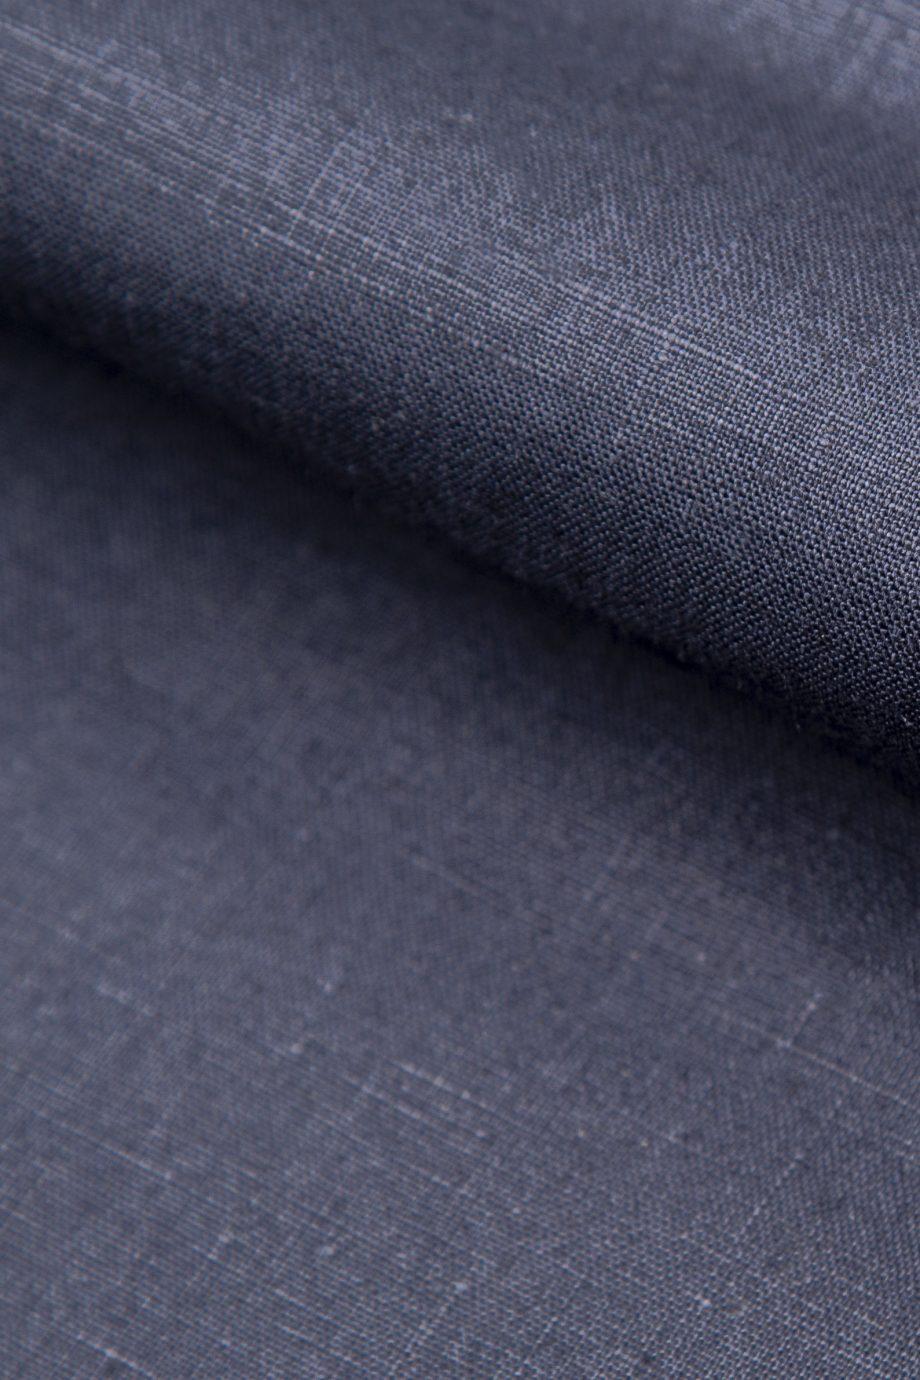 Navy eco-certified, plain weave, 100% linen, hand cut